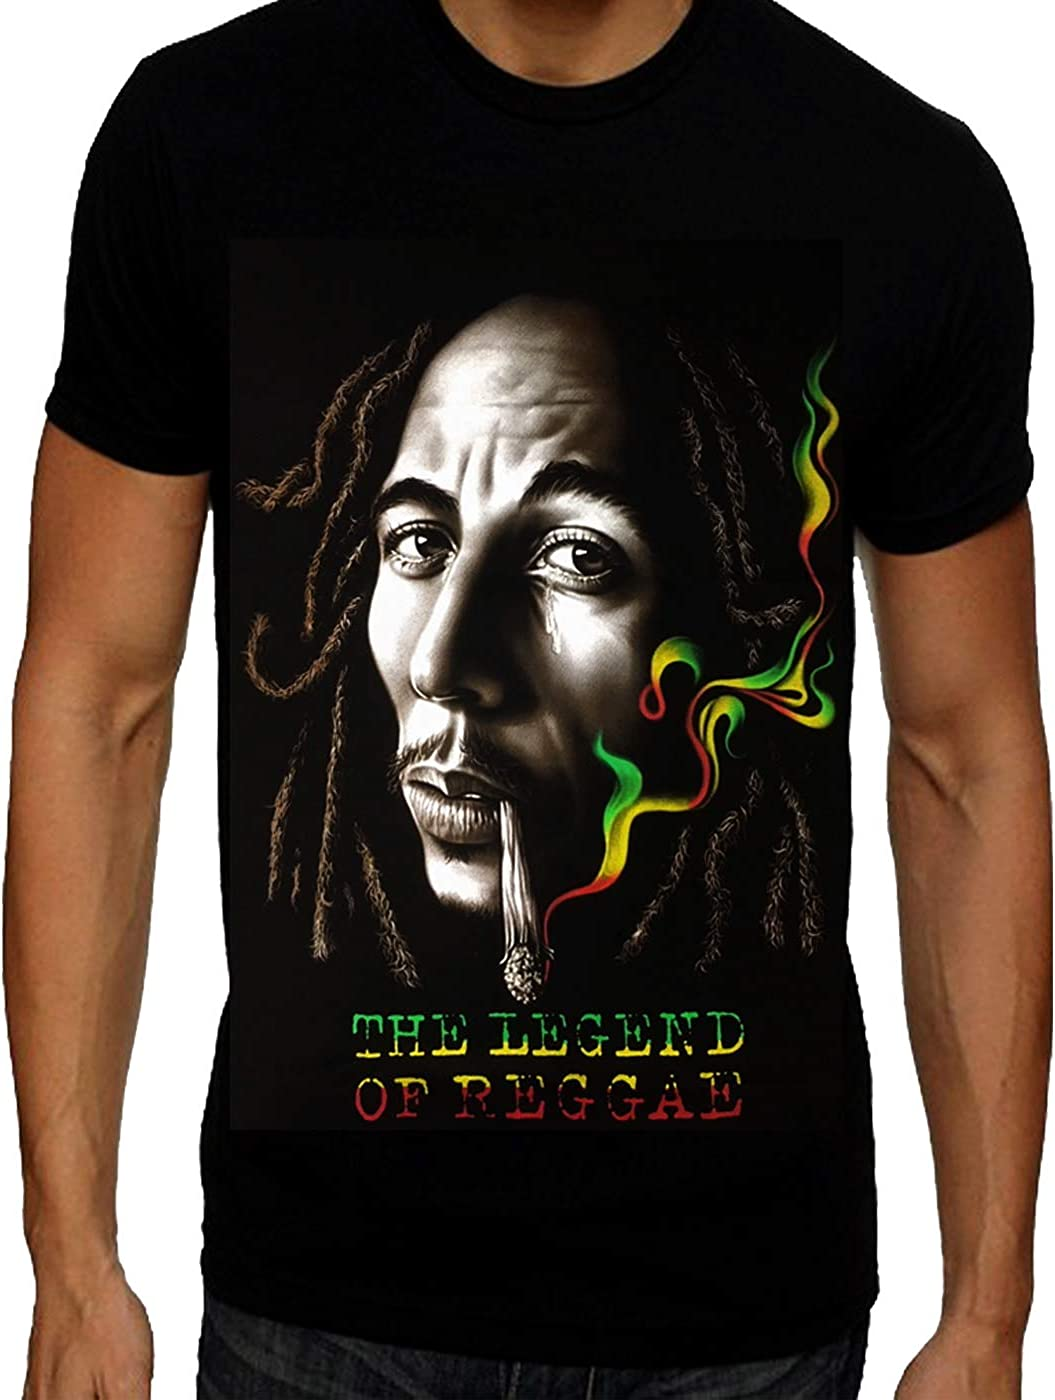 Camiseta para hombre de Bob Marley, diseño de Reggae de Jamaica ...